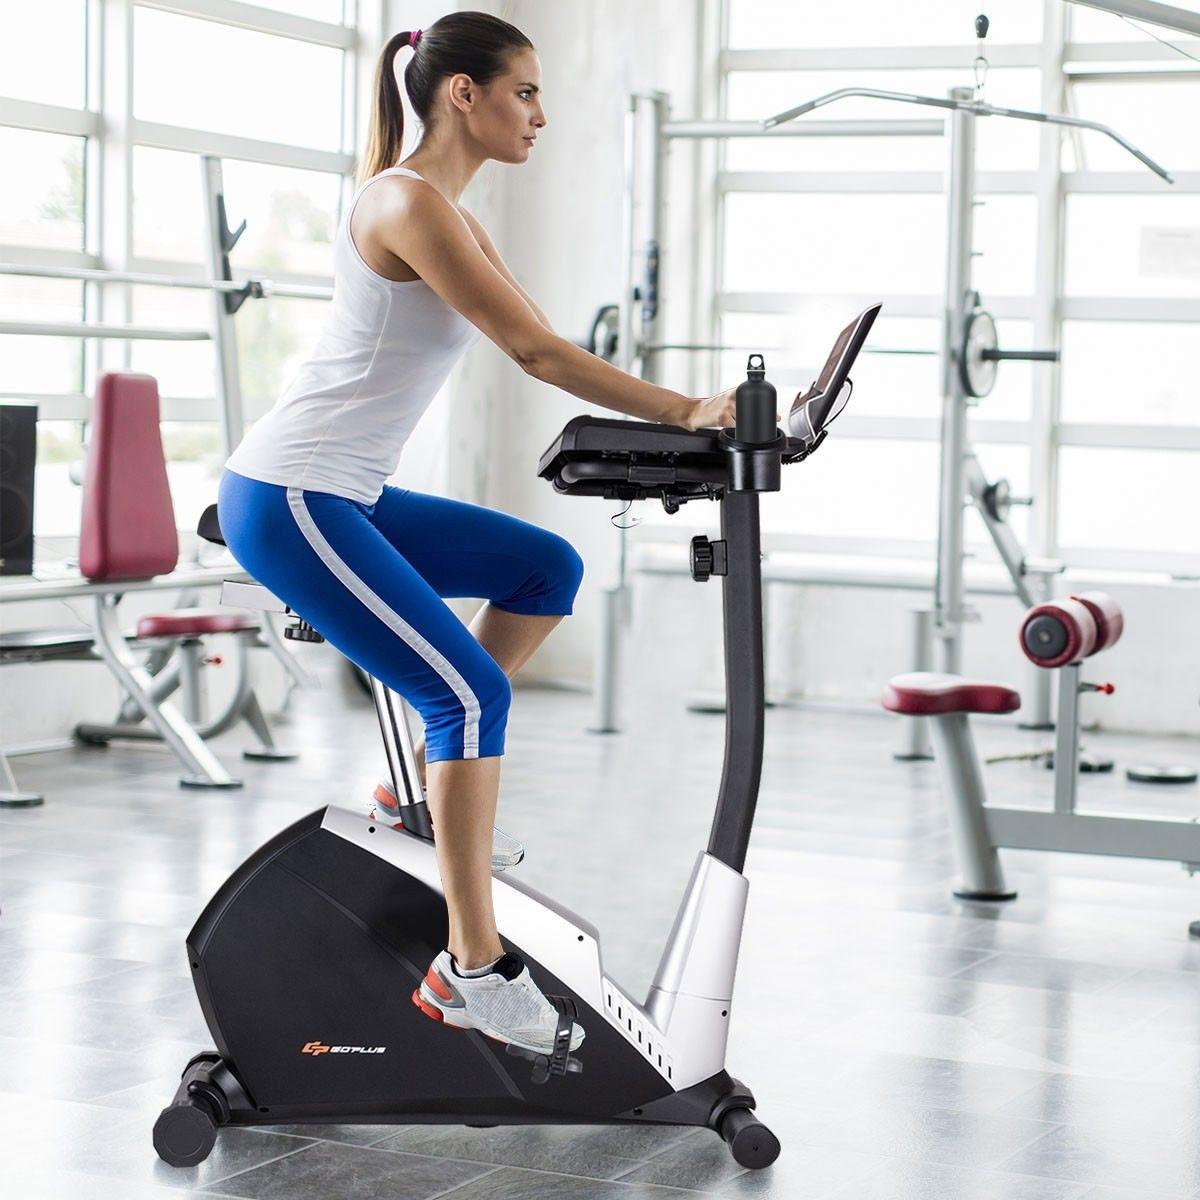 Upright Stationary Laptop Tray Exercise Bicycle